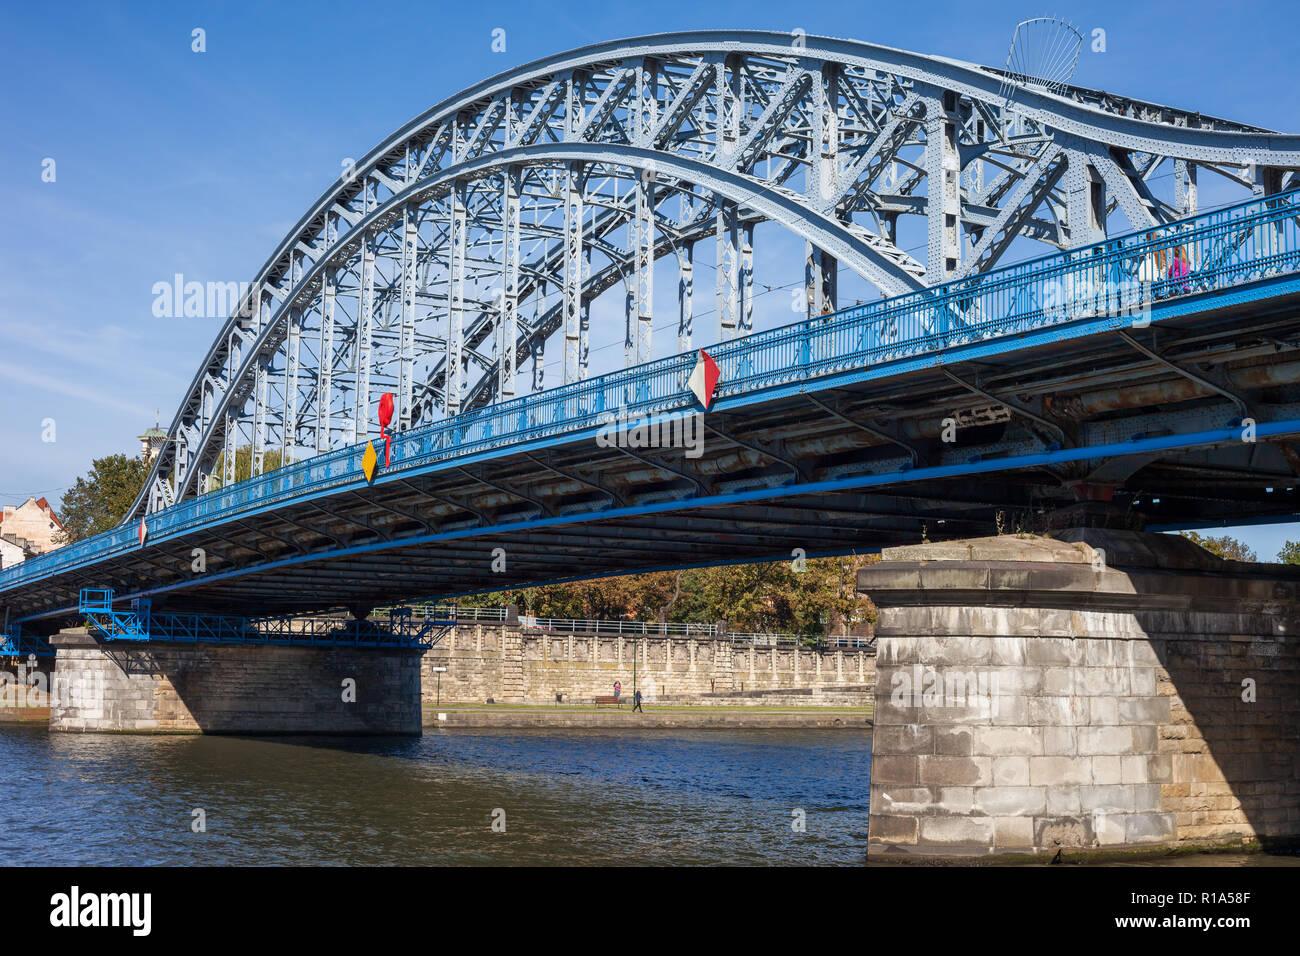 Jozef Pilsudski Bridge on Vistula river in Krakow, Poland